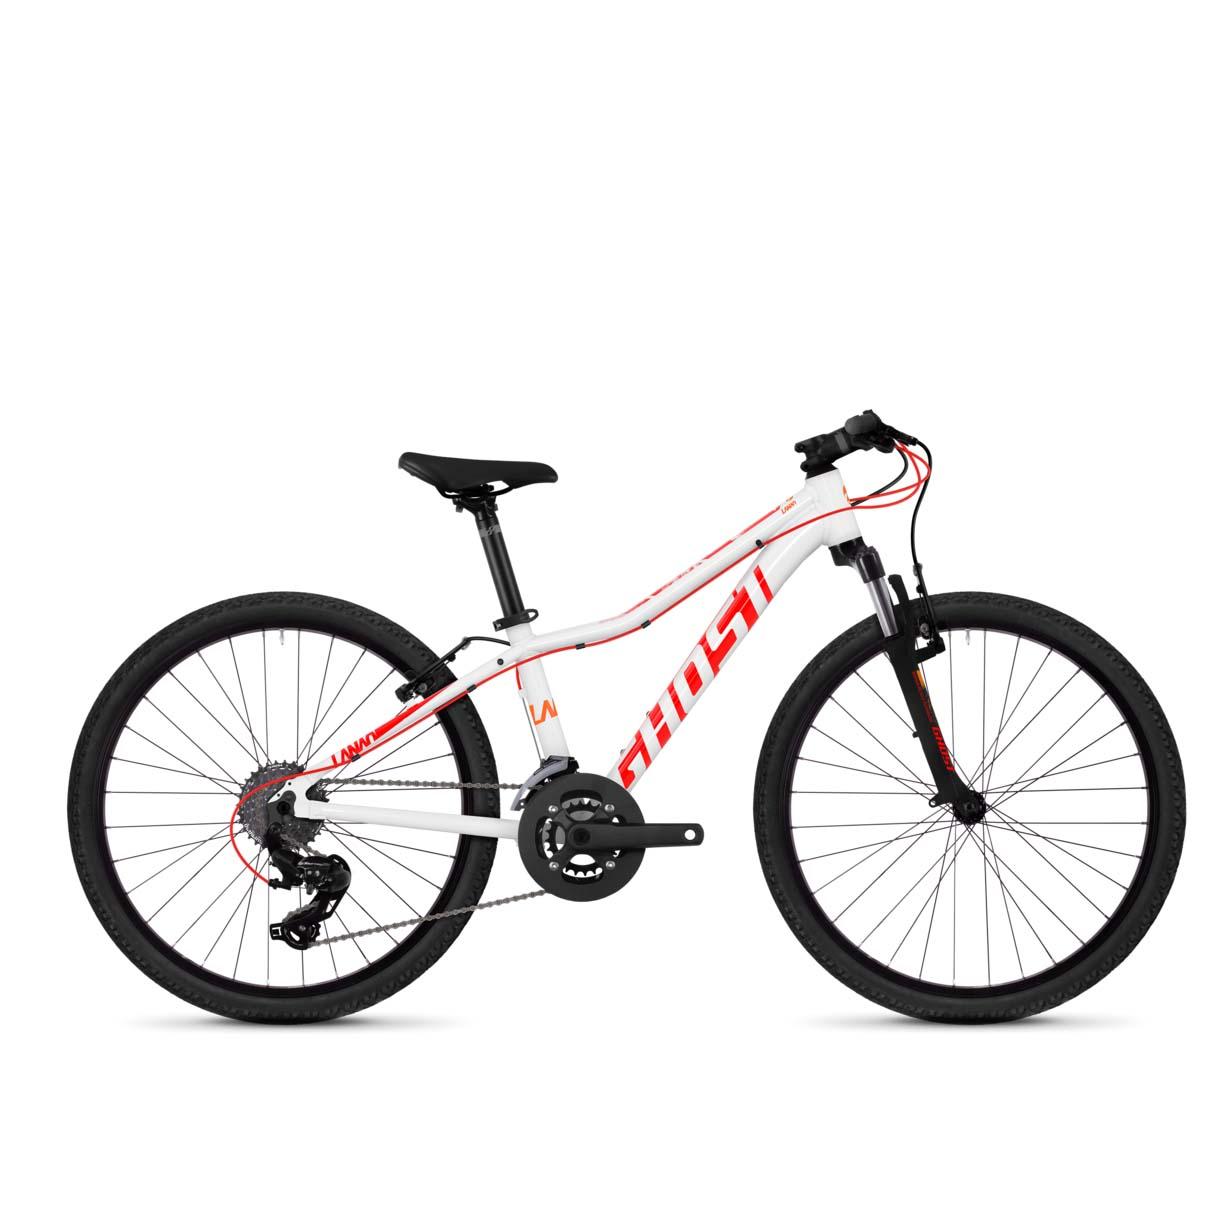 Фото Велосипед Ghost Lanao 2.4 24″ , 2019